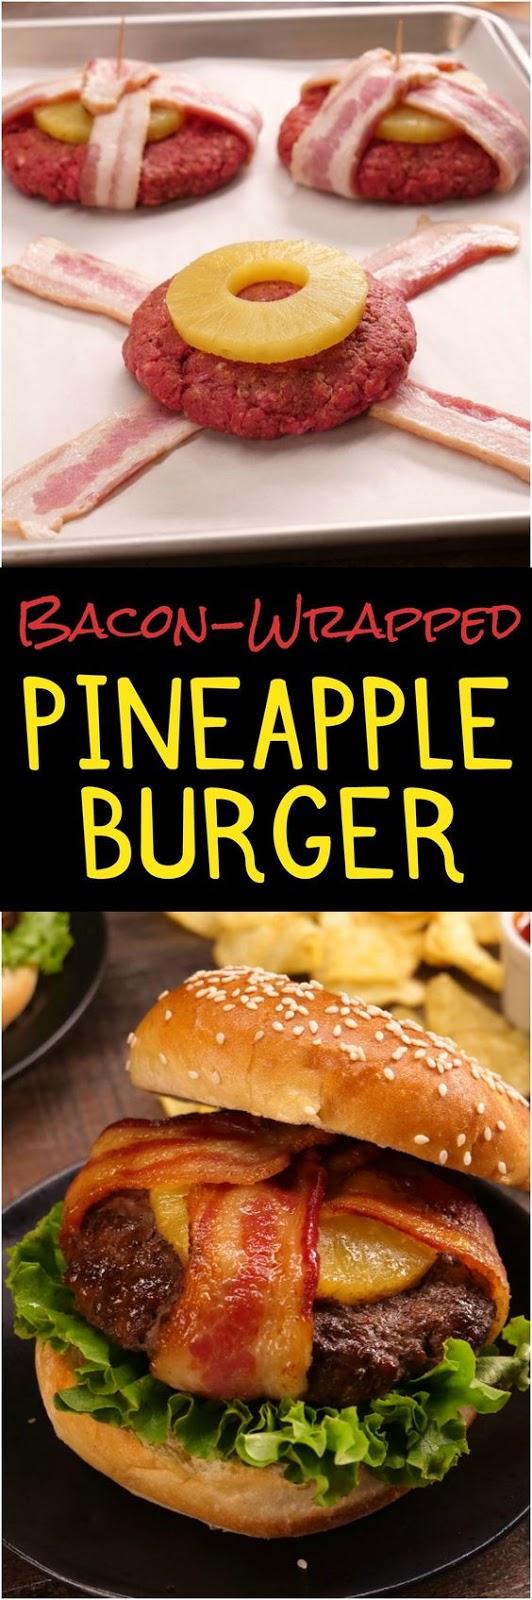 Bacon-Wrapped Píneapple Burgers